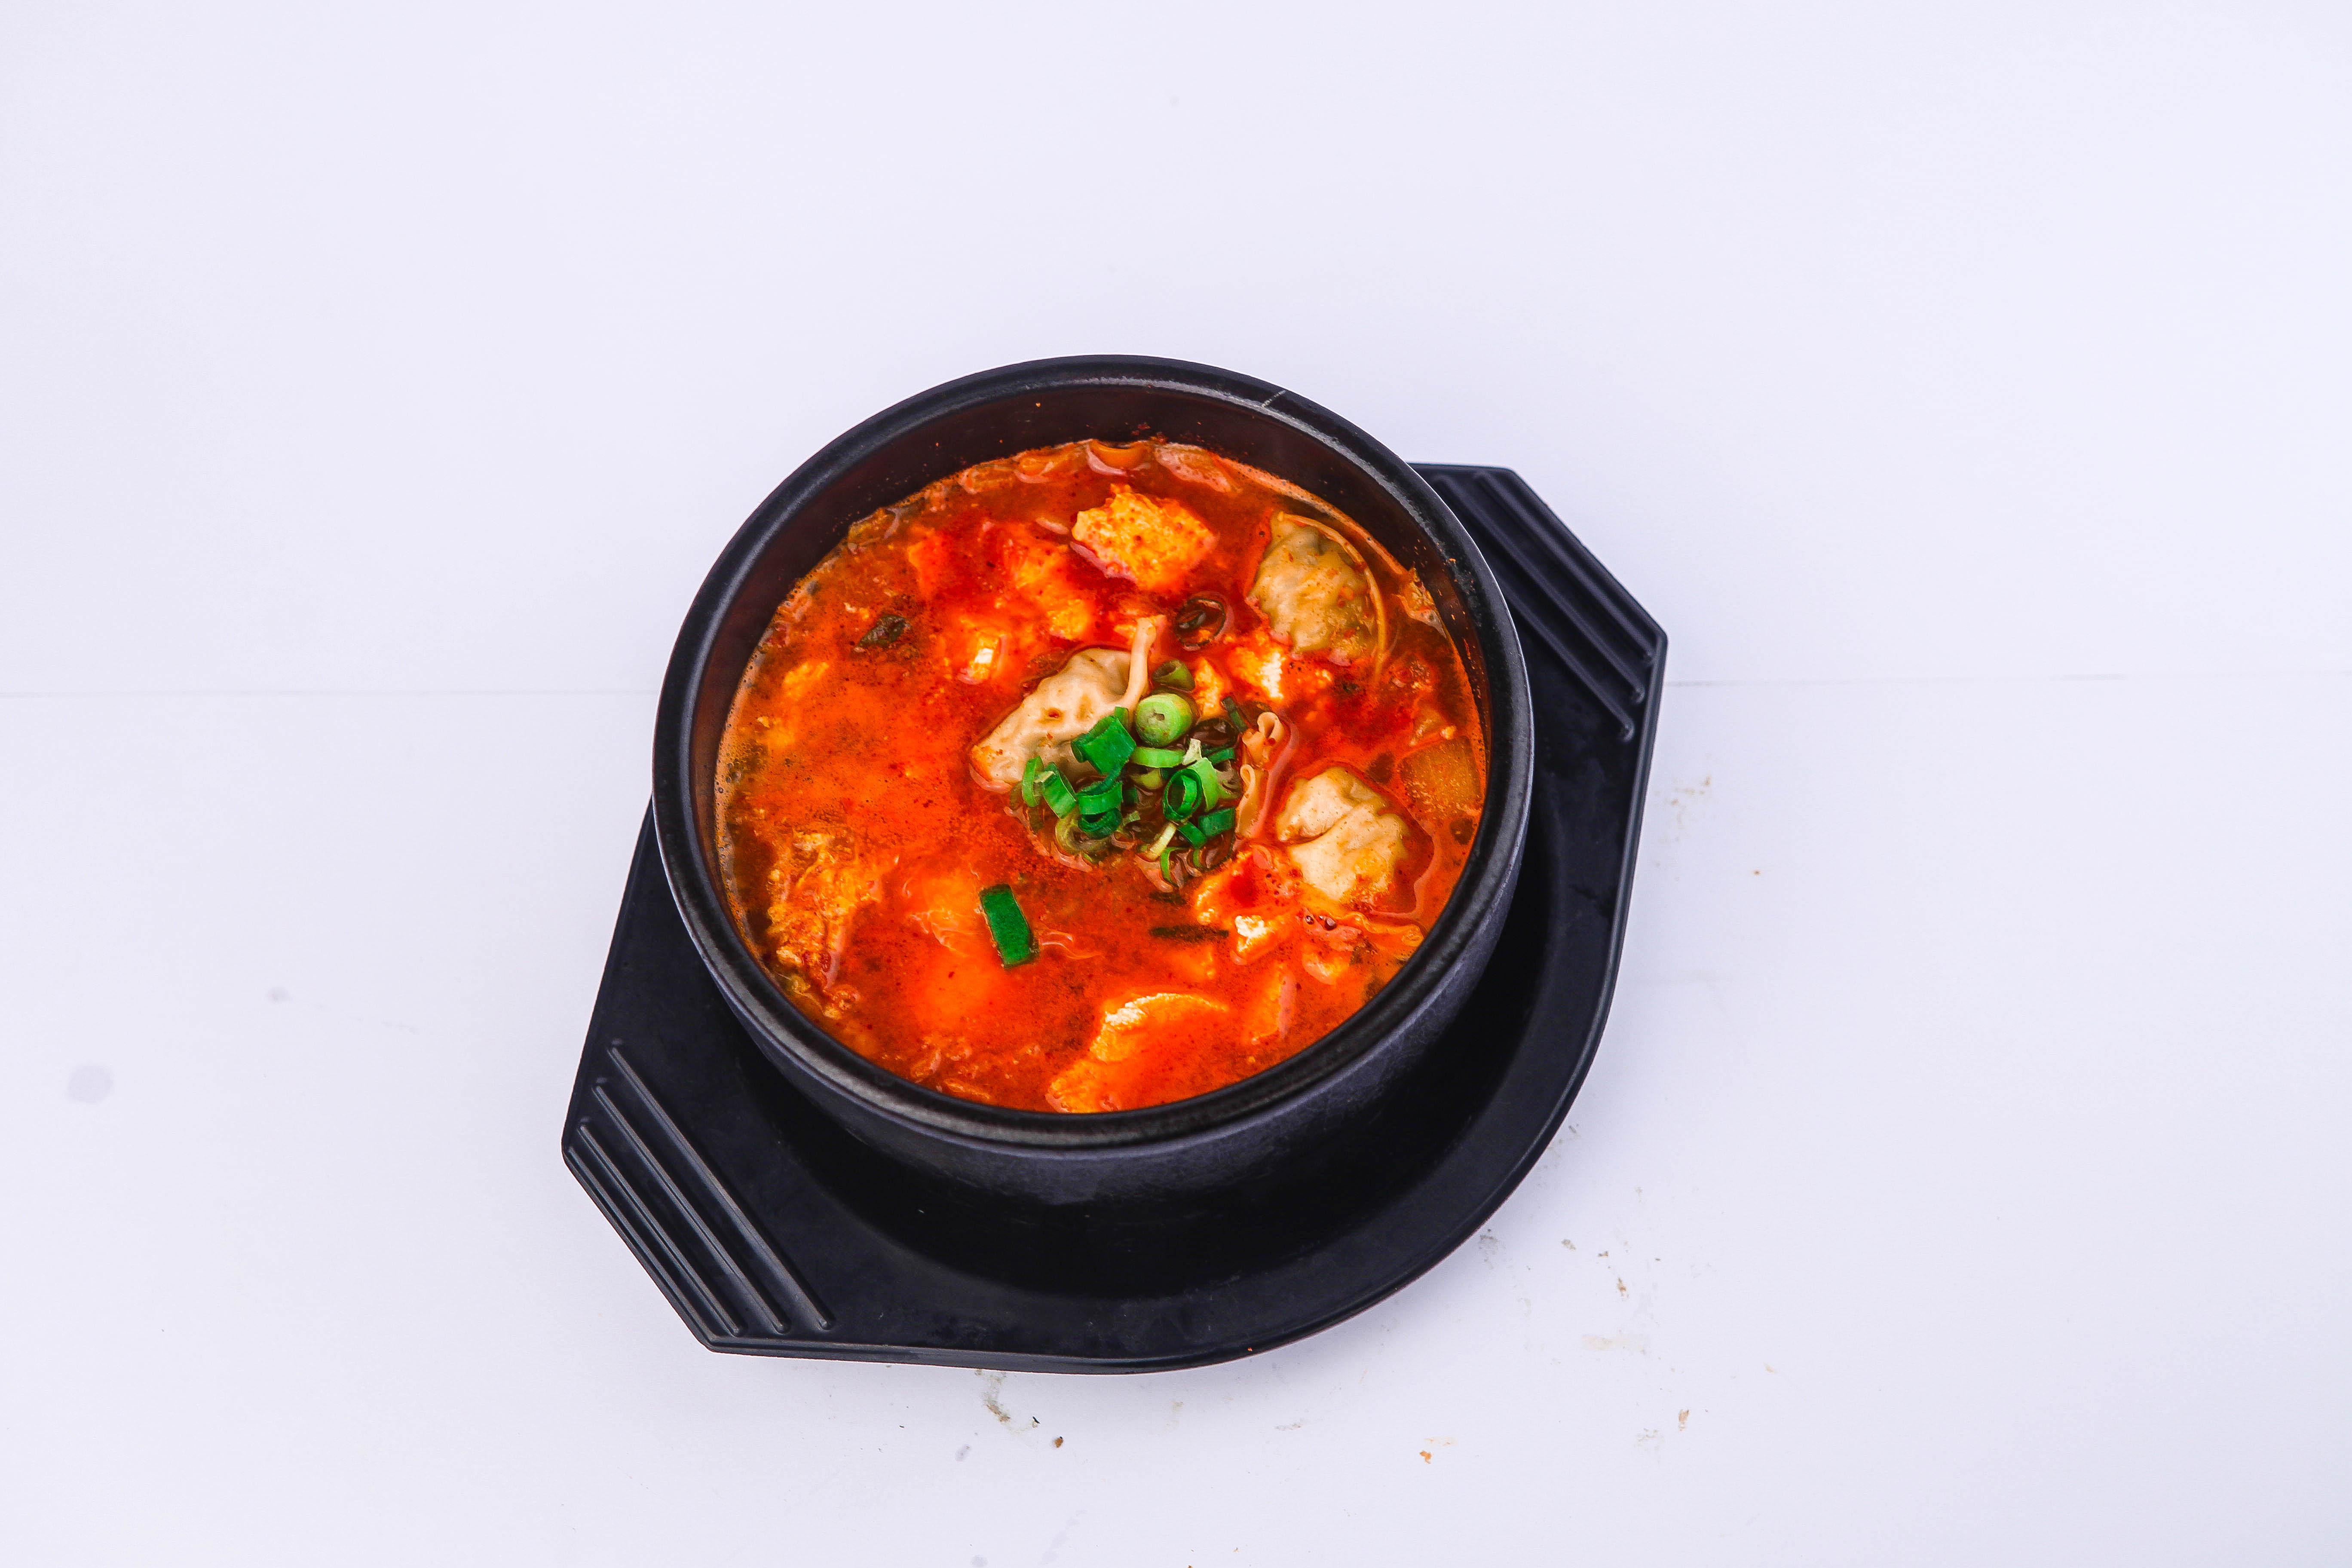 liquor-licensed-korean-restaurant-chinatown-300k-profit-to-owner-3